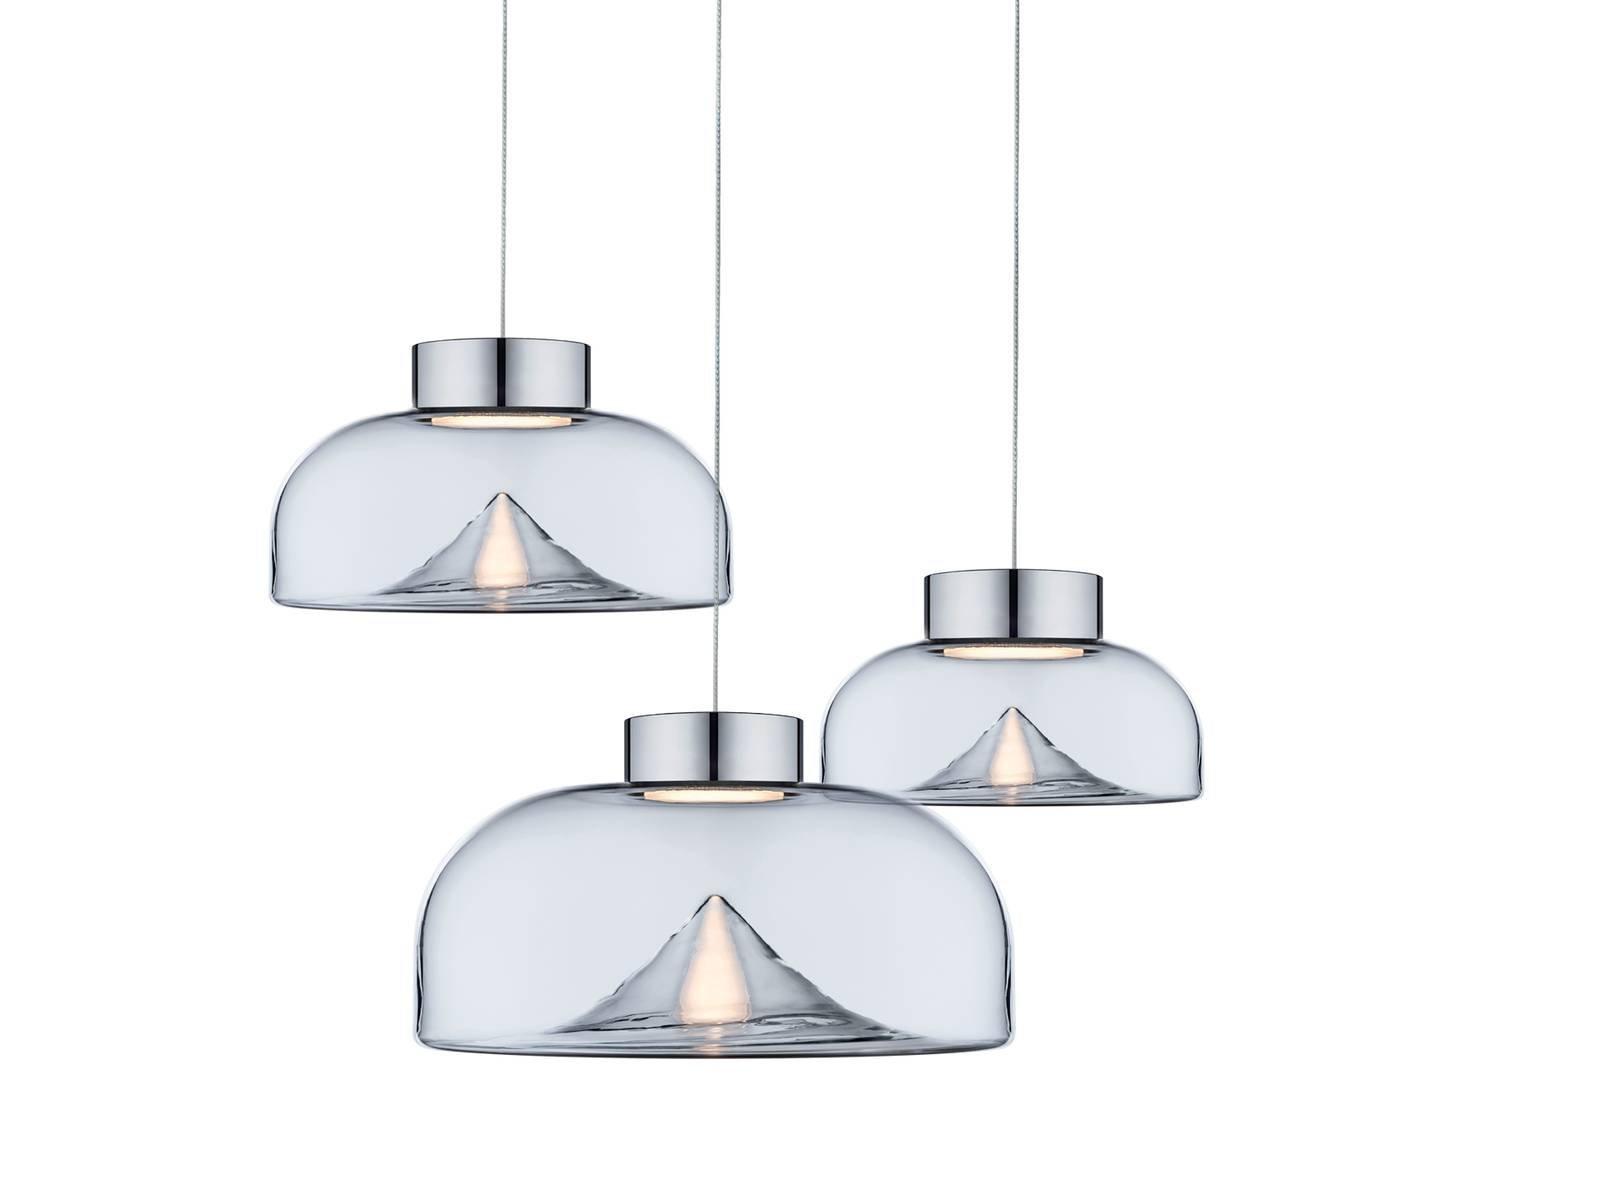 Lampade Cristallo Di Boemia : Euroluce lampadari a sospensione cose di casa